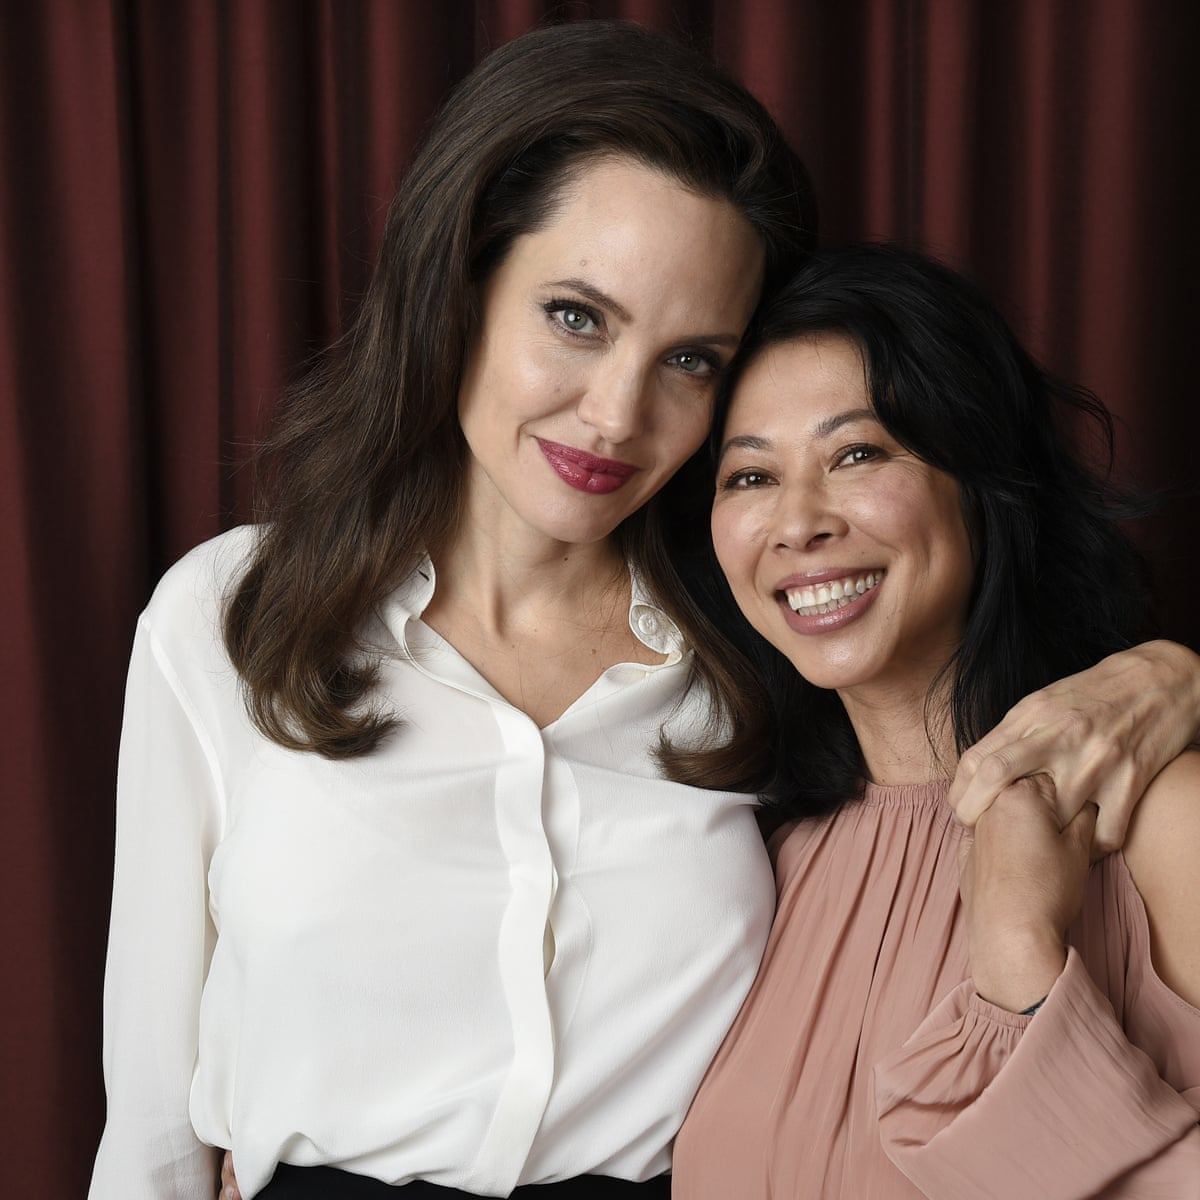 Angelina Jolie Porn Look A Like angelina jolie has found a powerful voice as a director